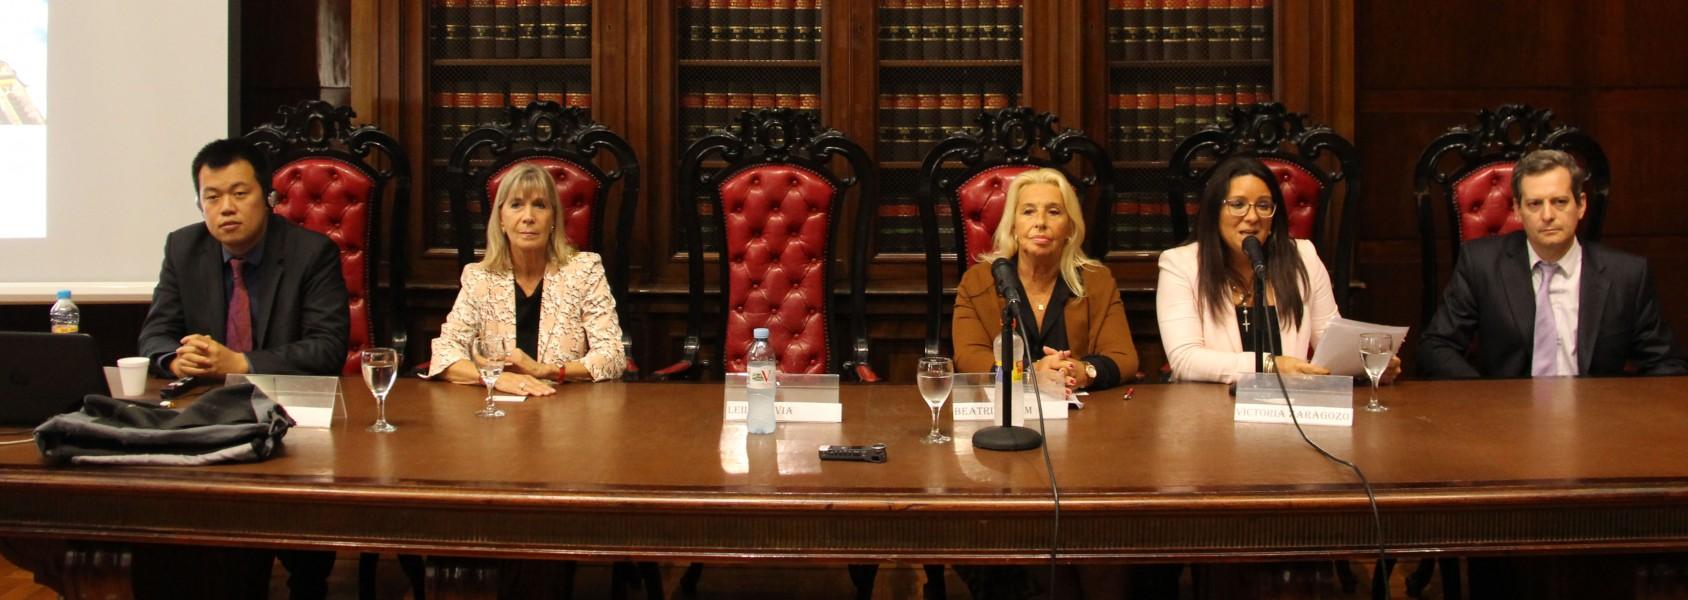 Nengye Liu, Silvia Nonna, Beatriz Krom, María Victoria Zarabozo Mila y Mariano Damián Ferro